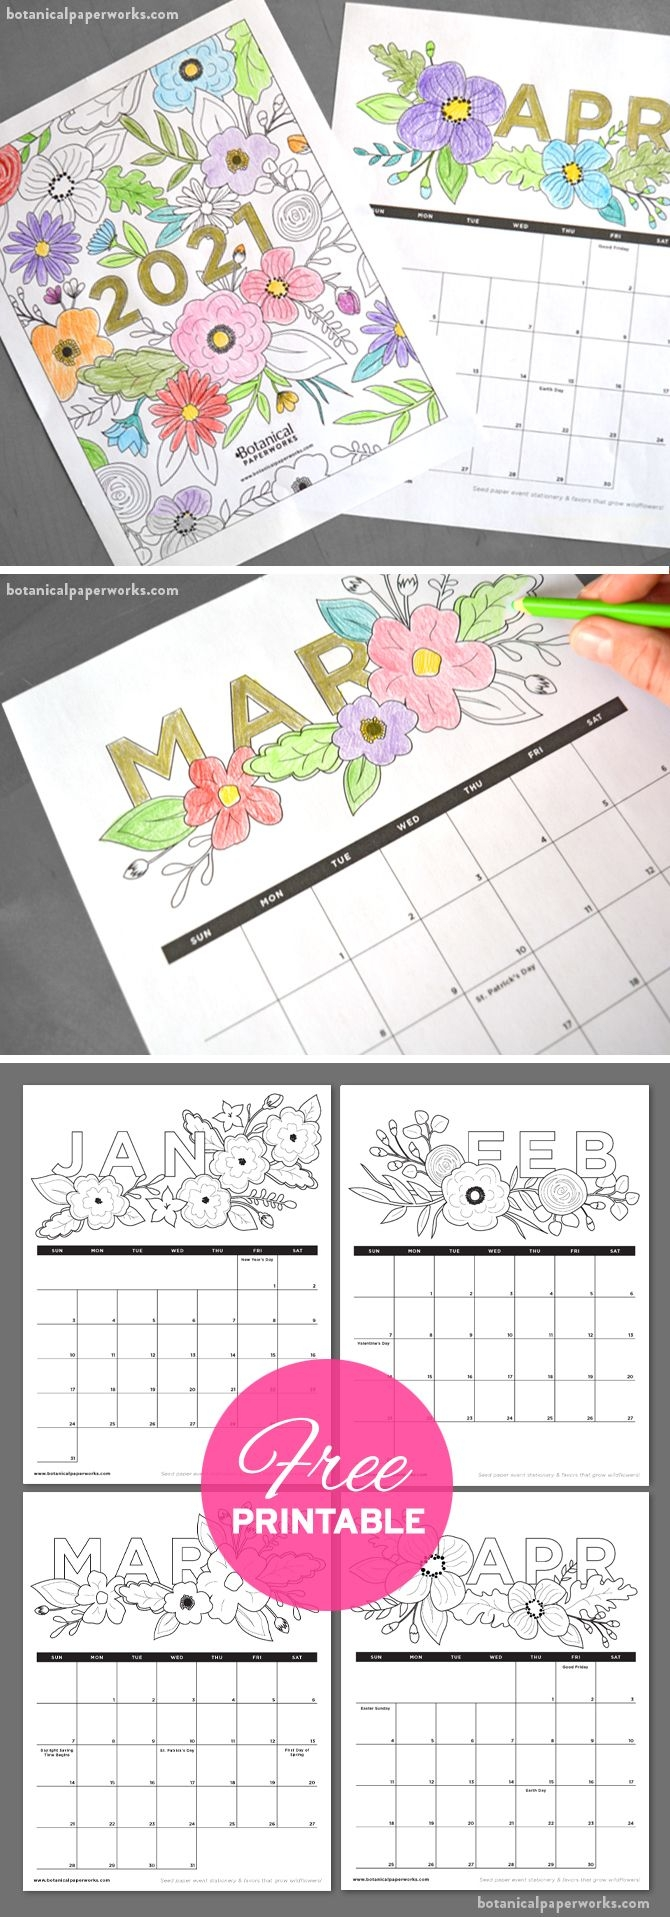 Free Printable 2021 Calendars | Botanical Paperworks